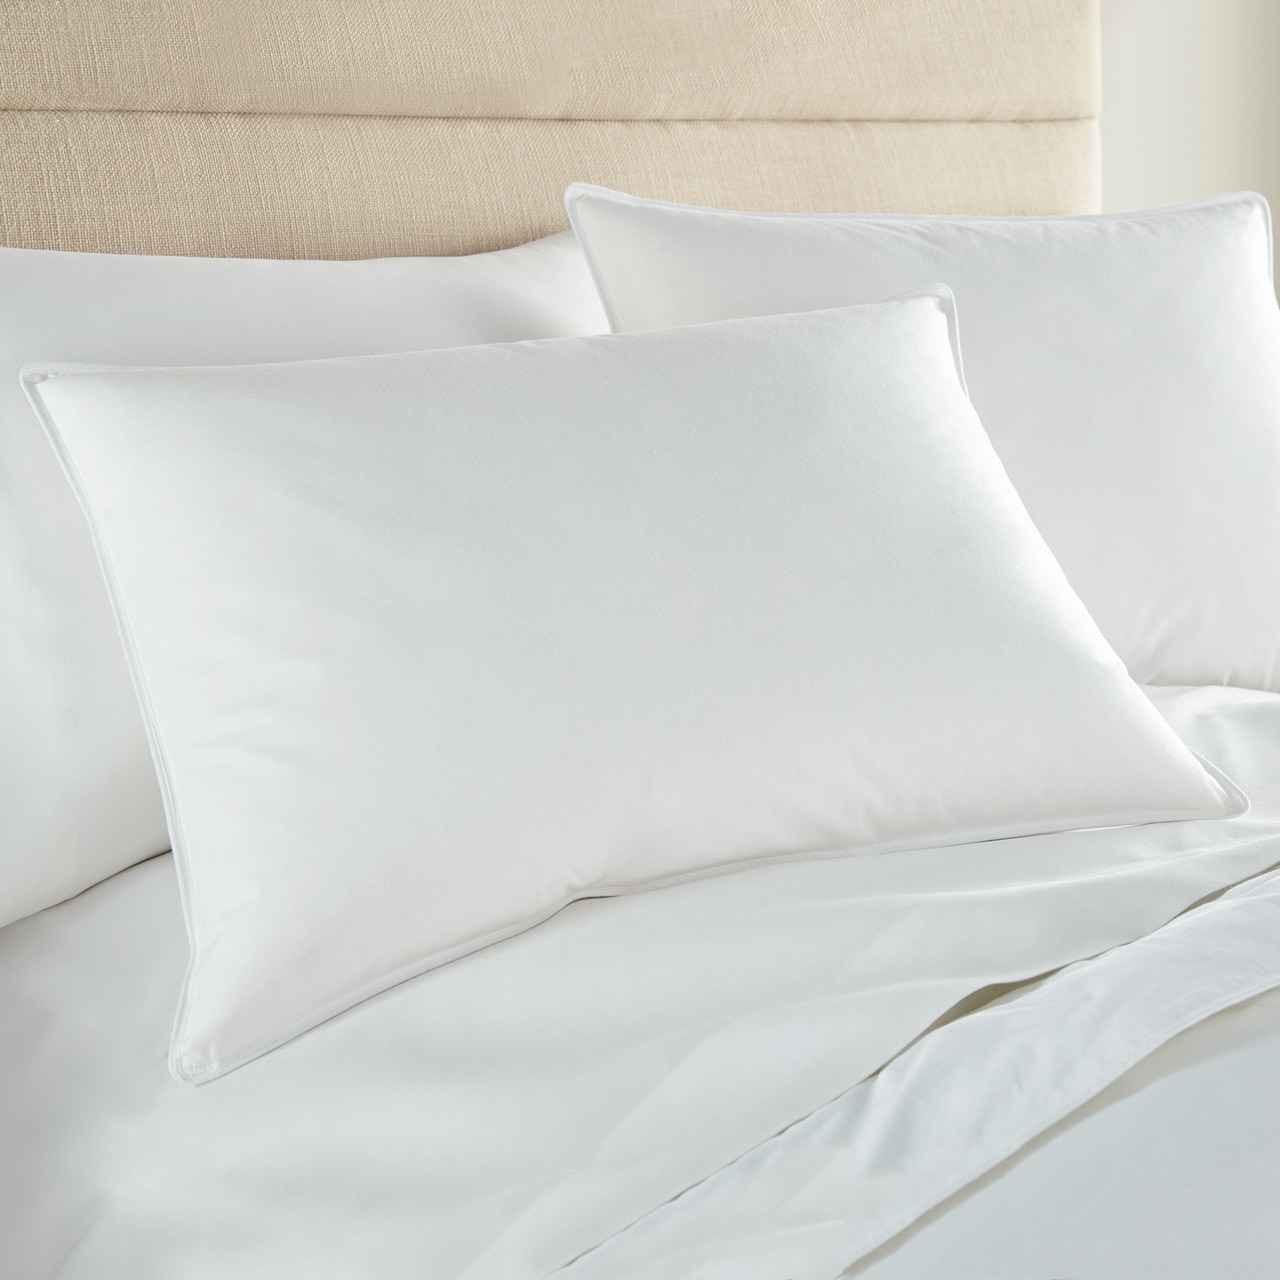 downlite soft density 230 tc rds certified down pillow standard size sale